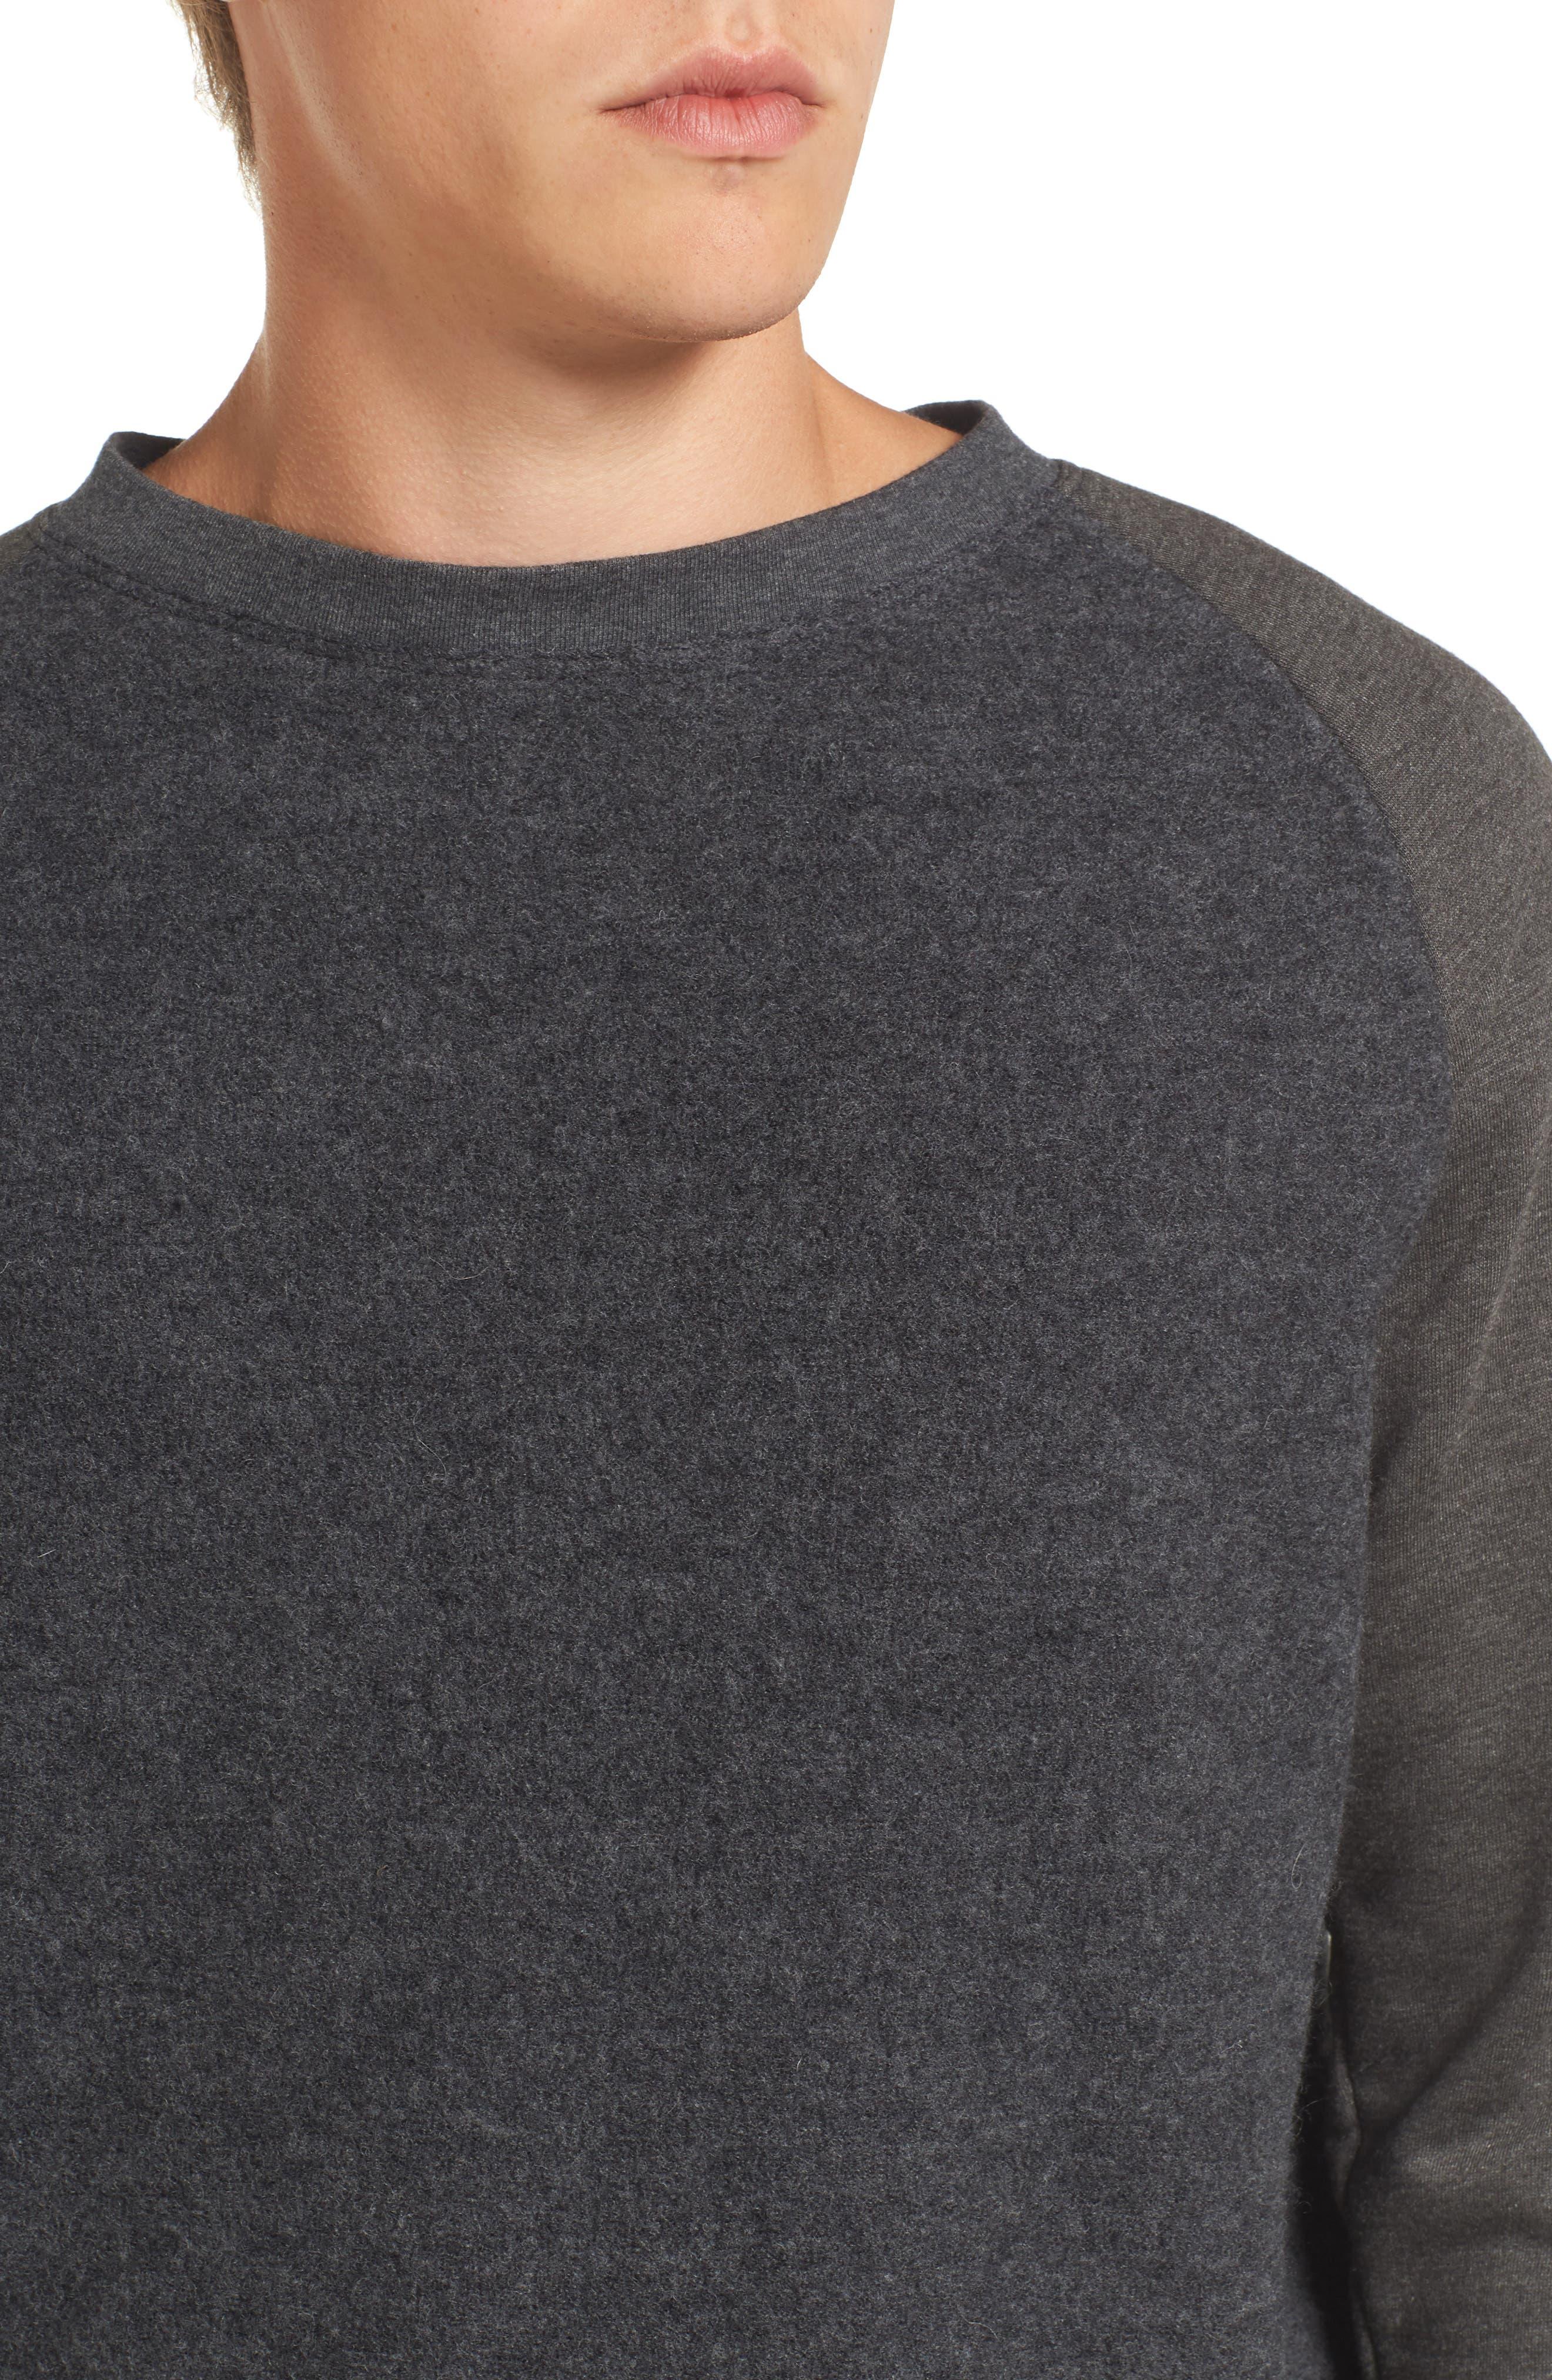 Crewneck Sweater,                             Alternate thumbnail 4, color,